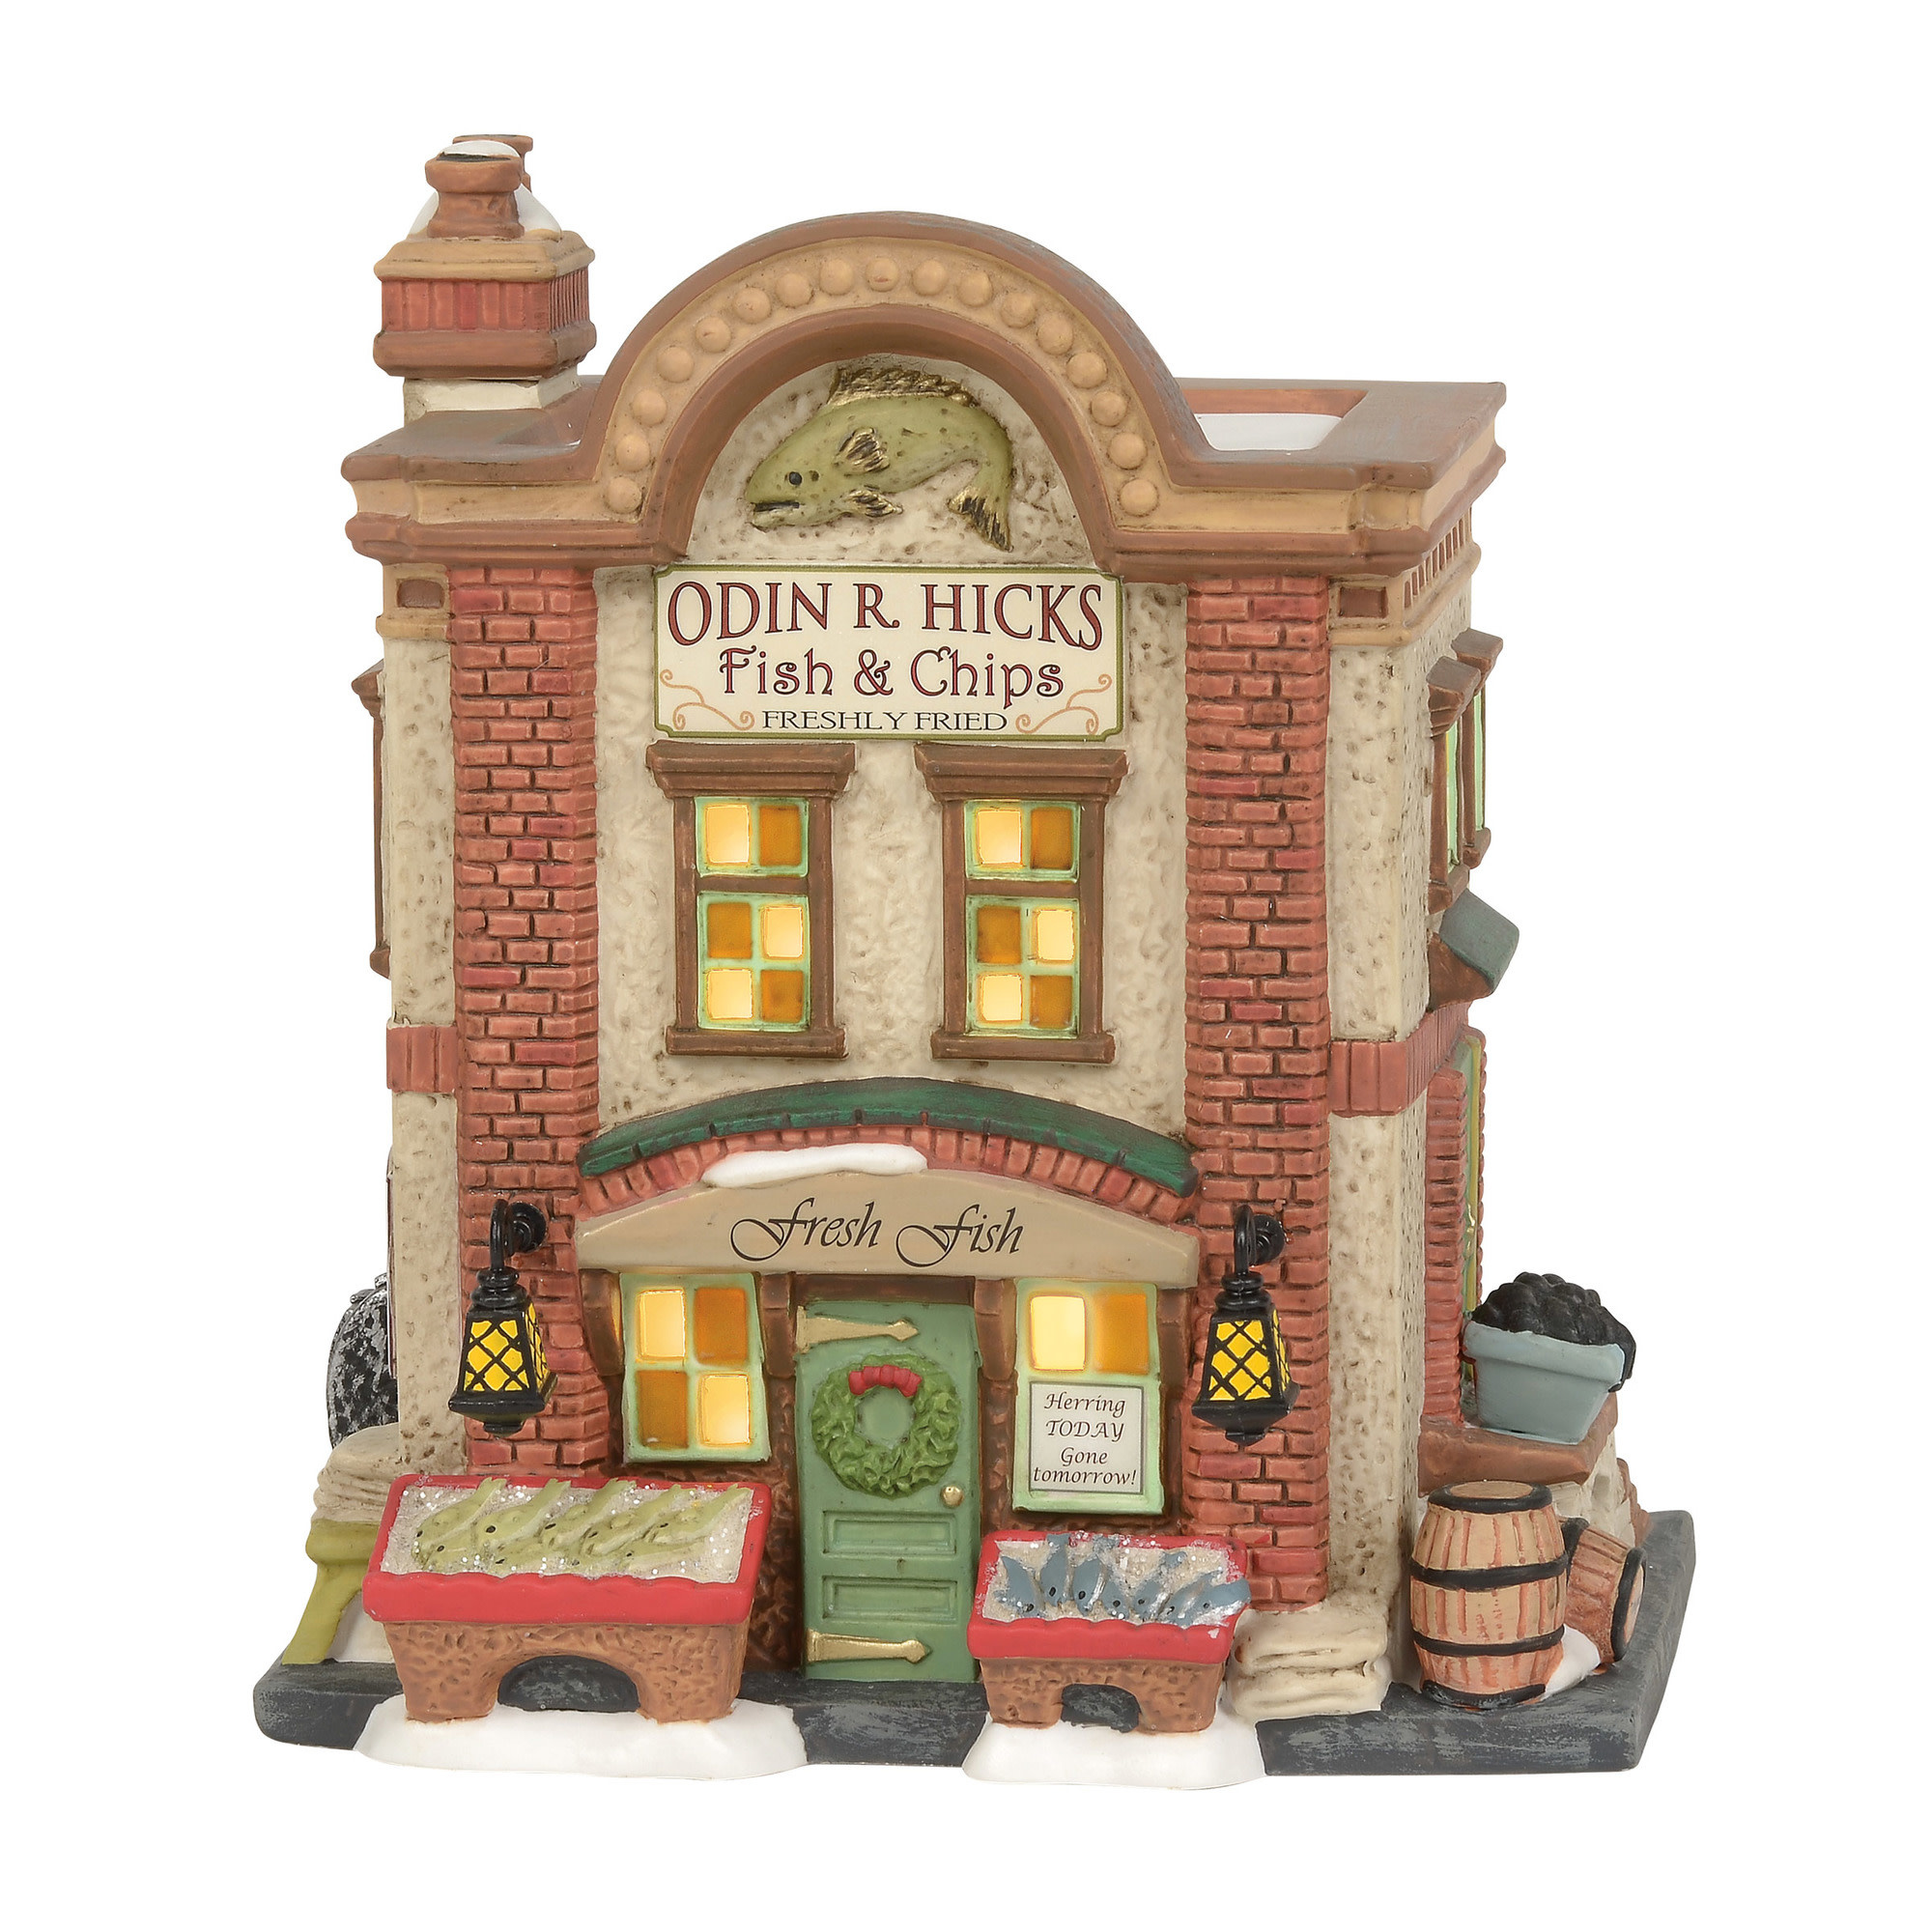 Dicken's Village Odin R. Hicks Fish & Chips